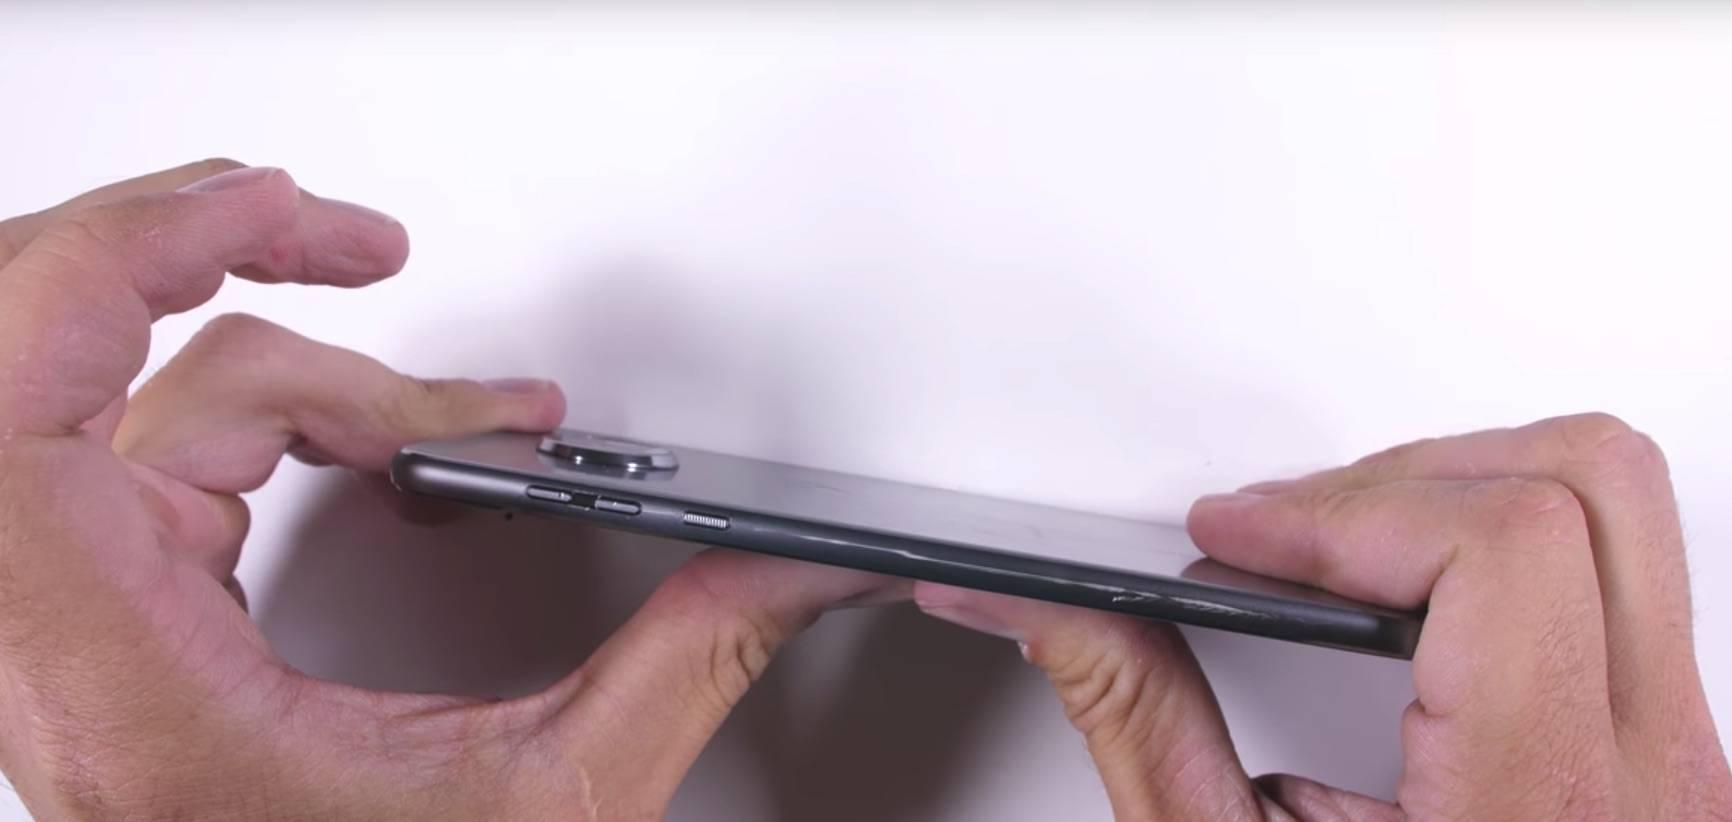 Sony A7000 Reddit